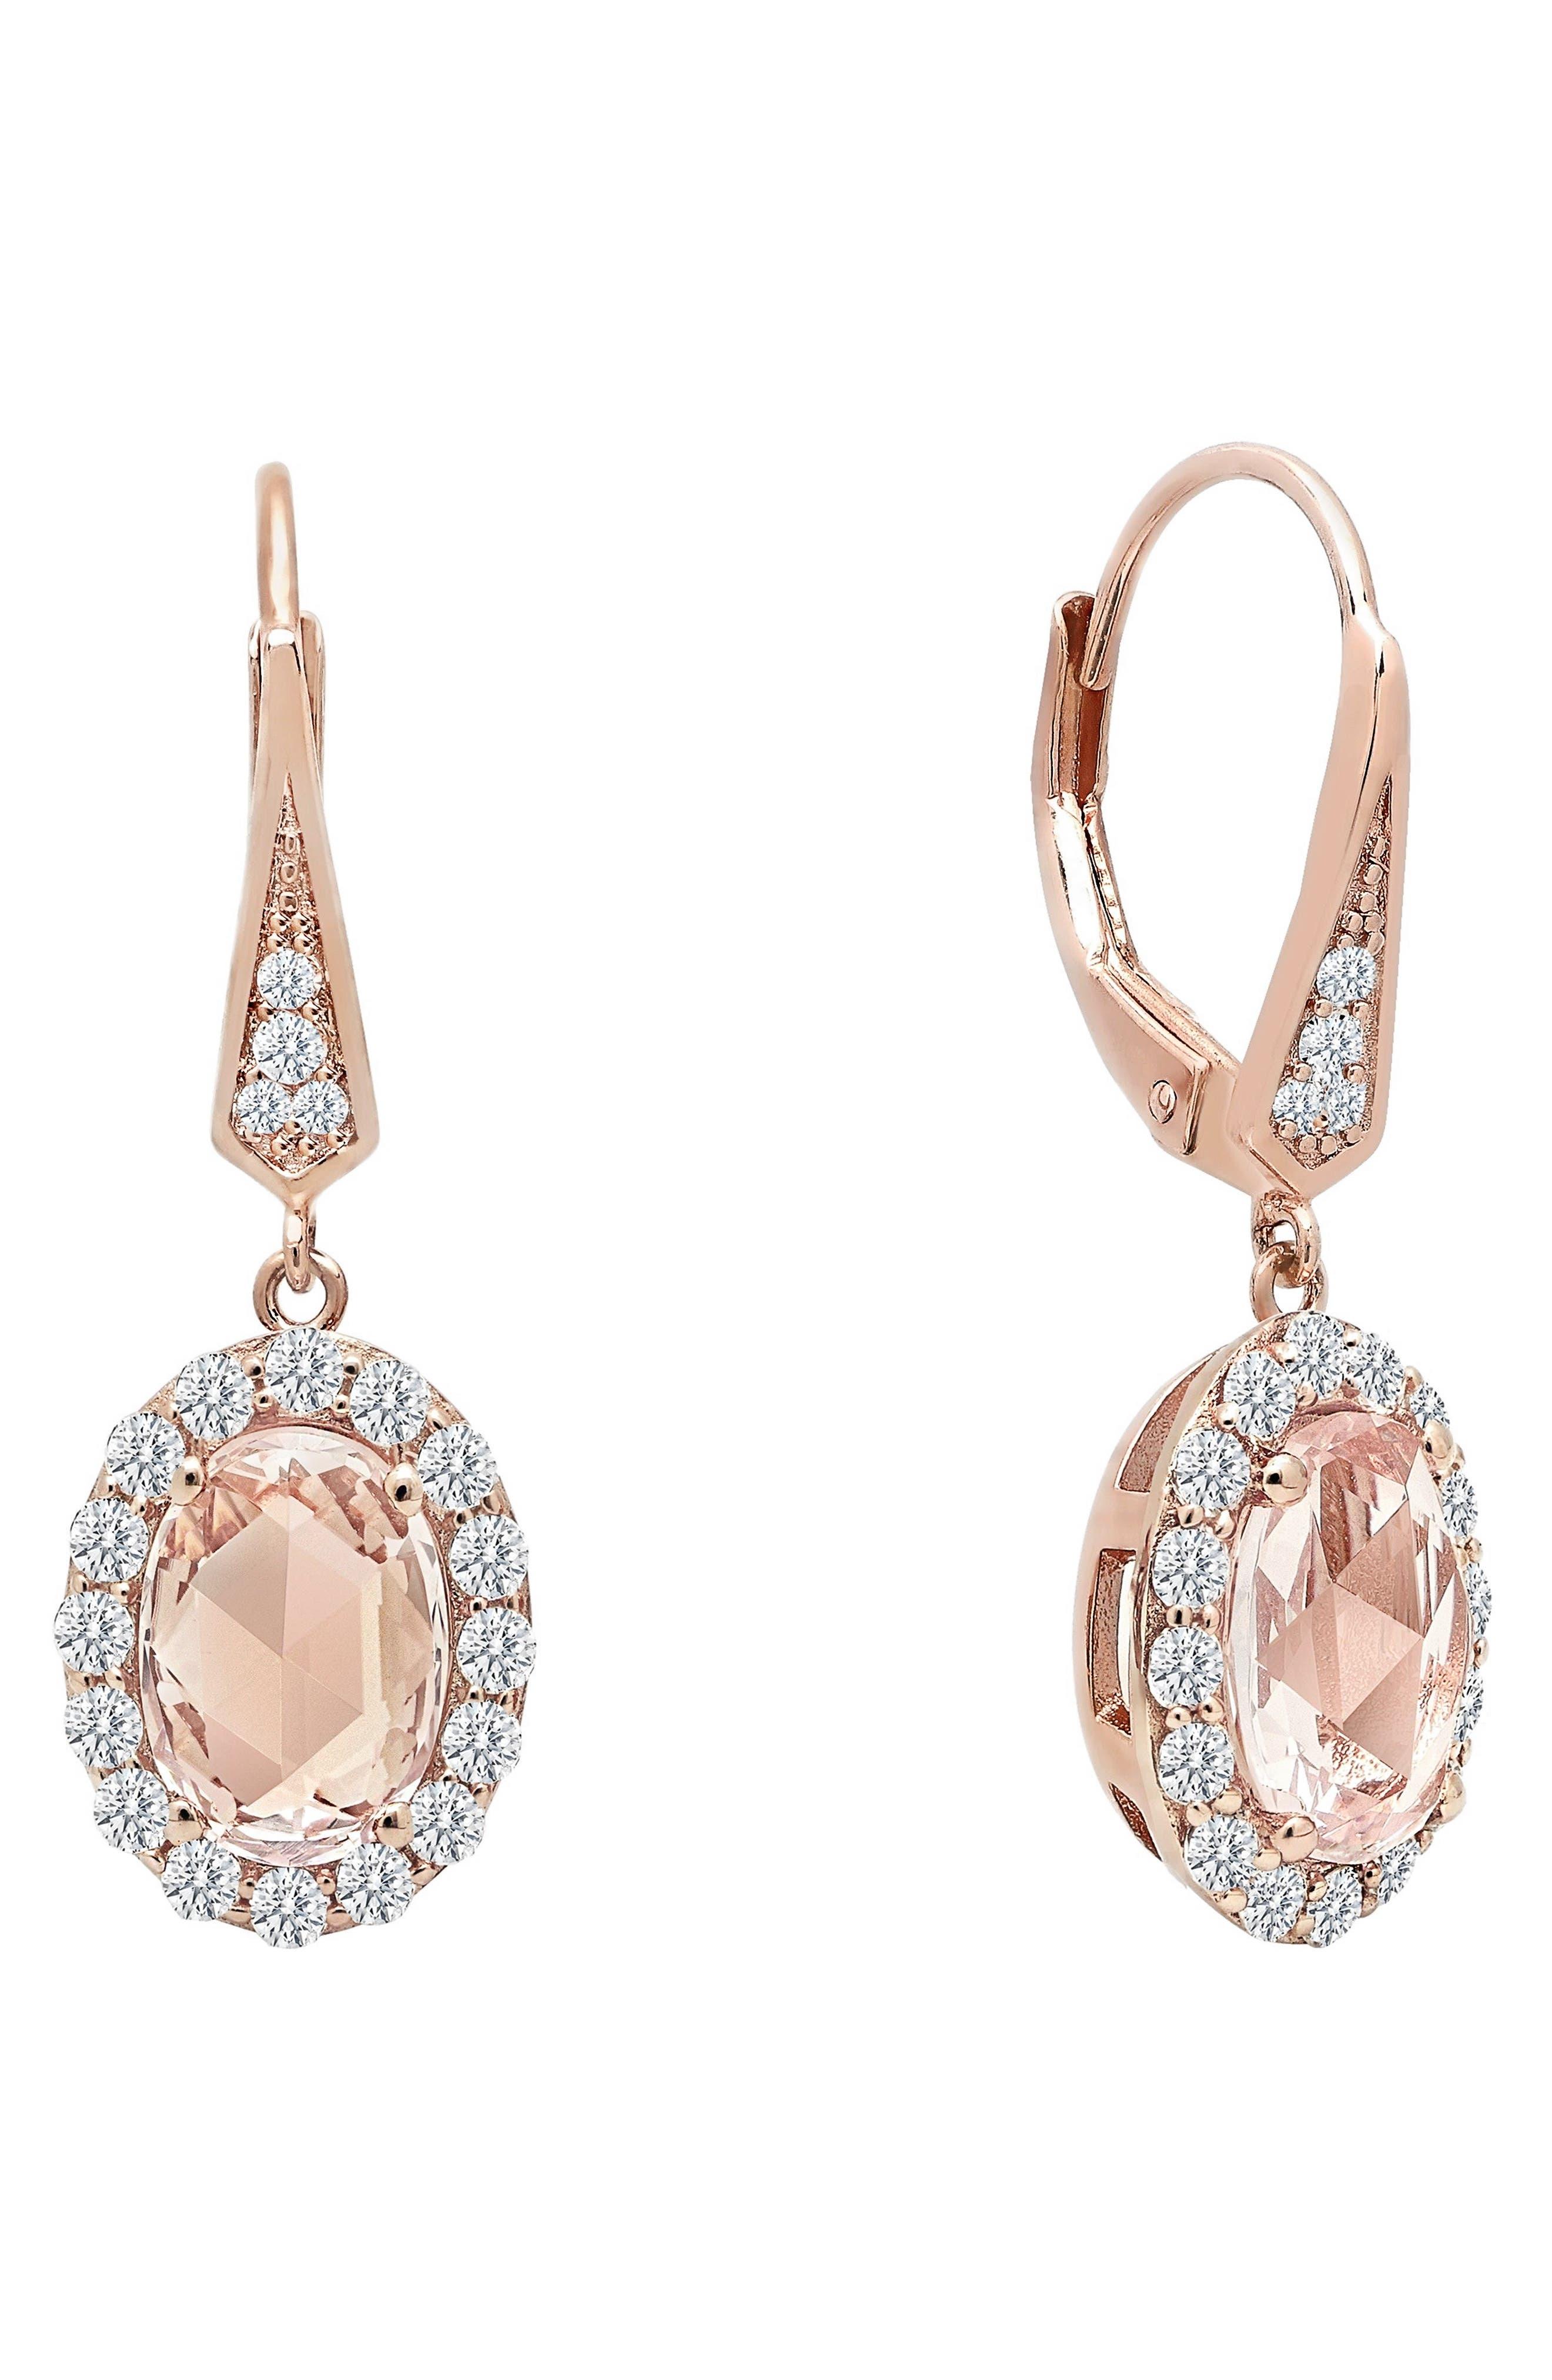 Simulated Diamond Drop Earrings,                             Main thumbnail 1, color,                             PINK / ROSE GOLD